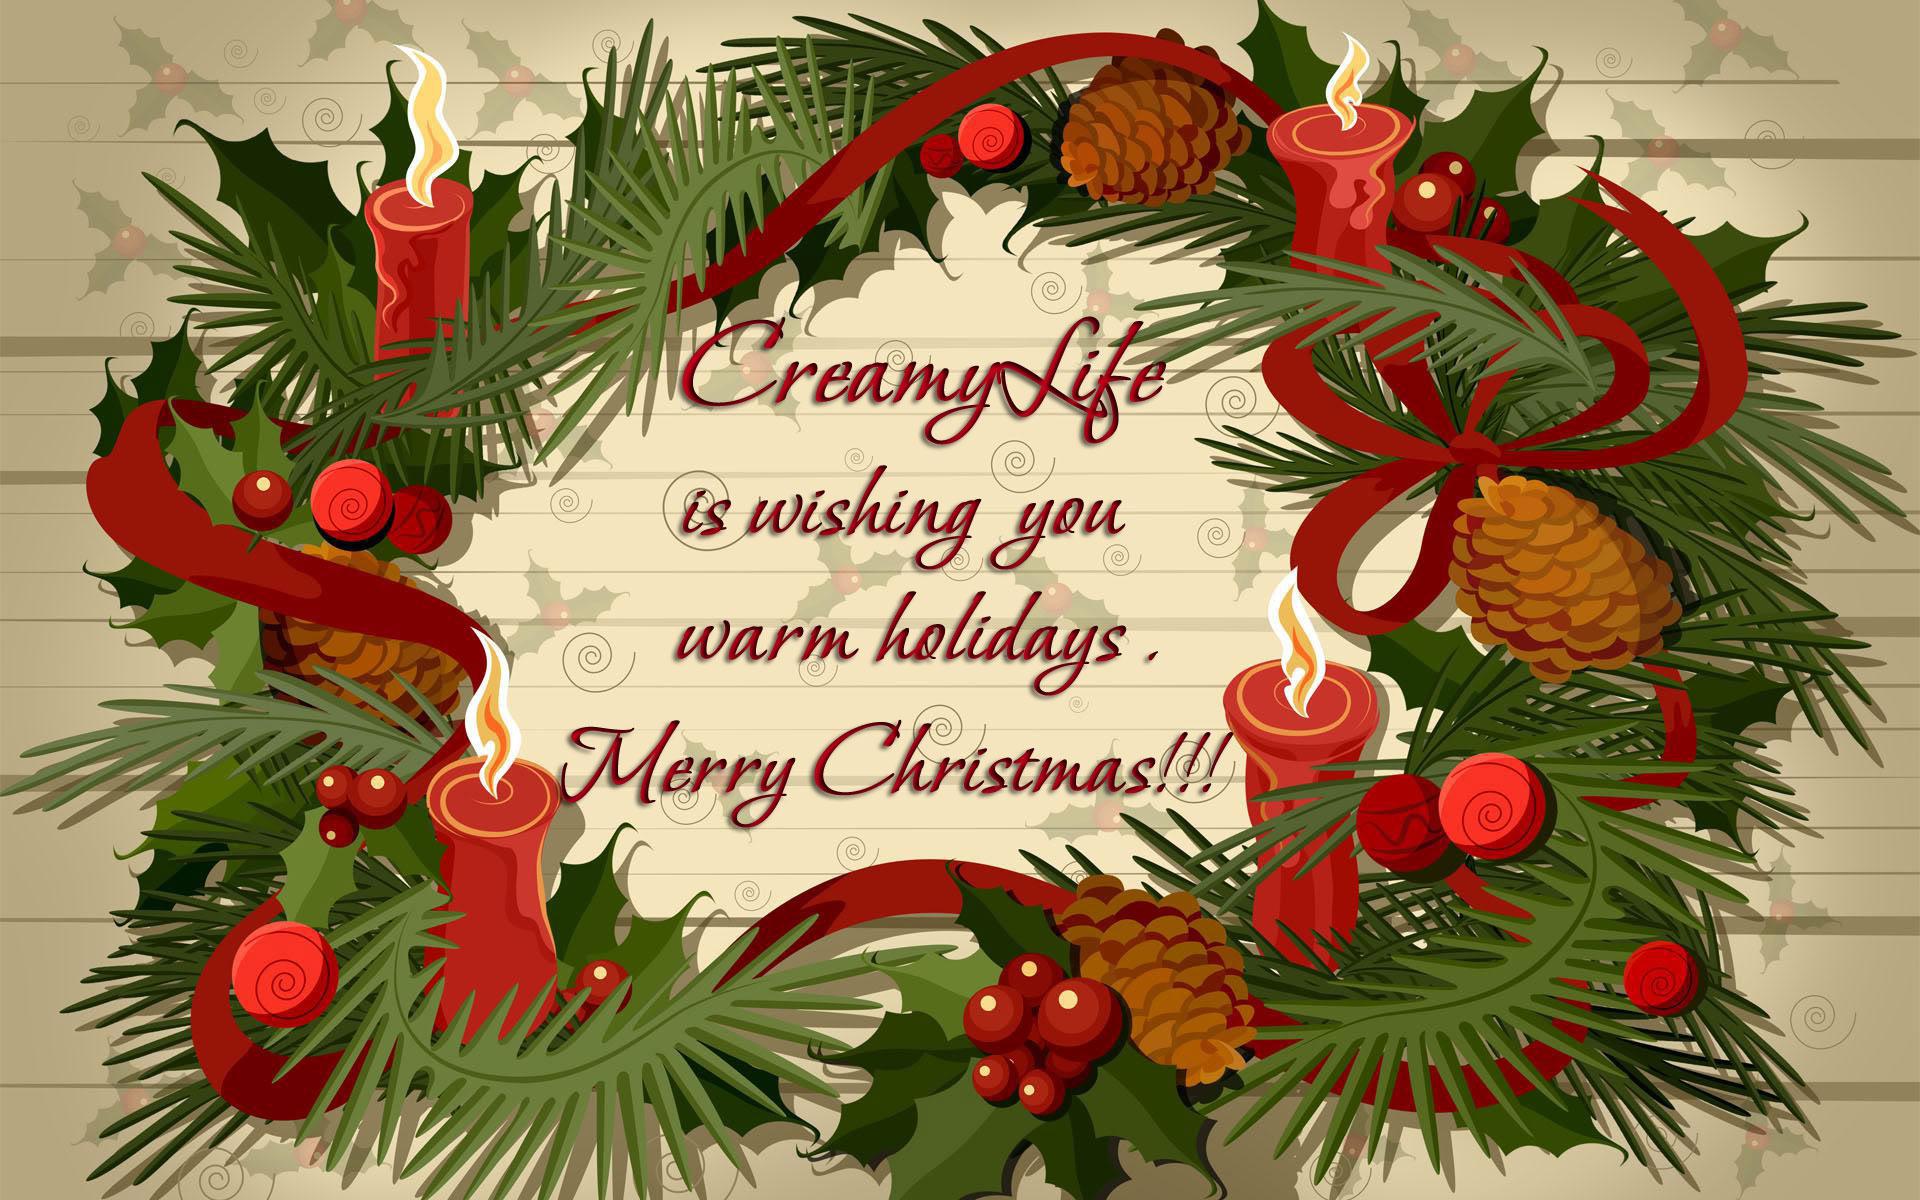 Merry Christmas Jesus Christ Birthday Hd Wallpaper Photo Wishes